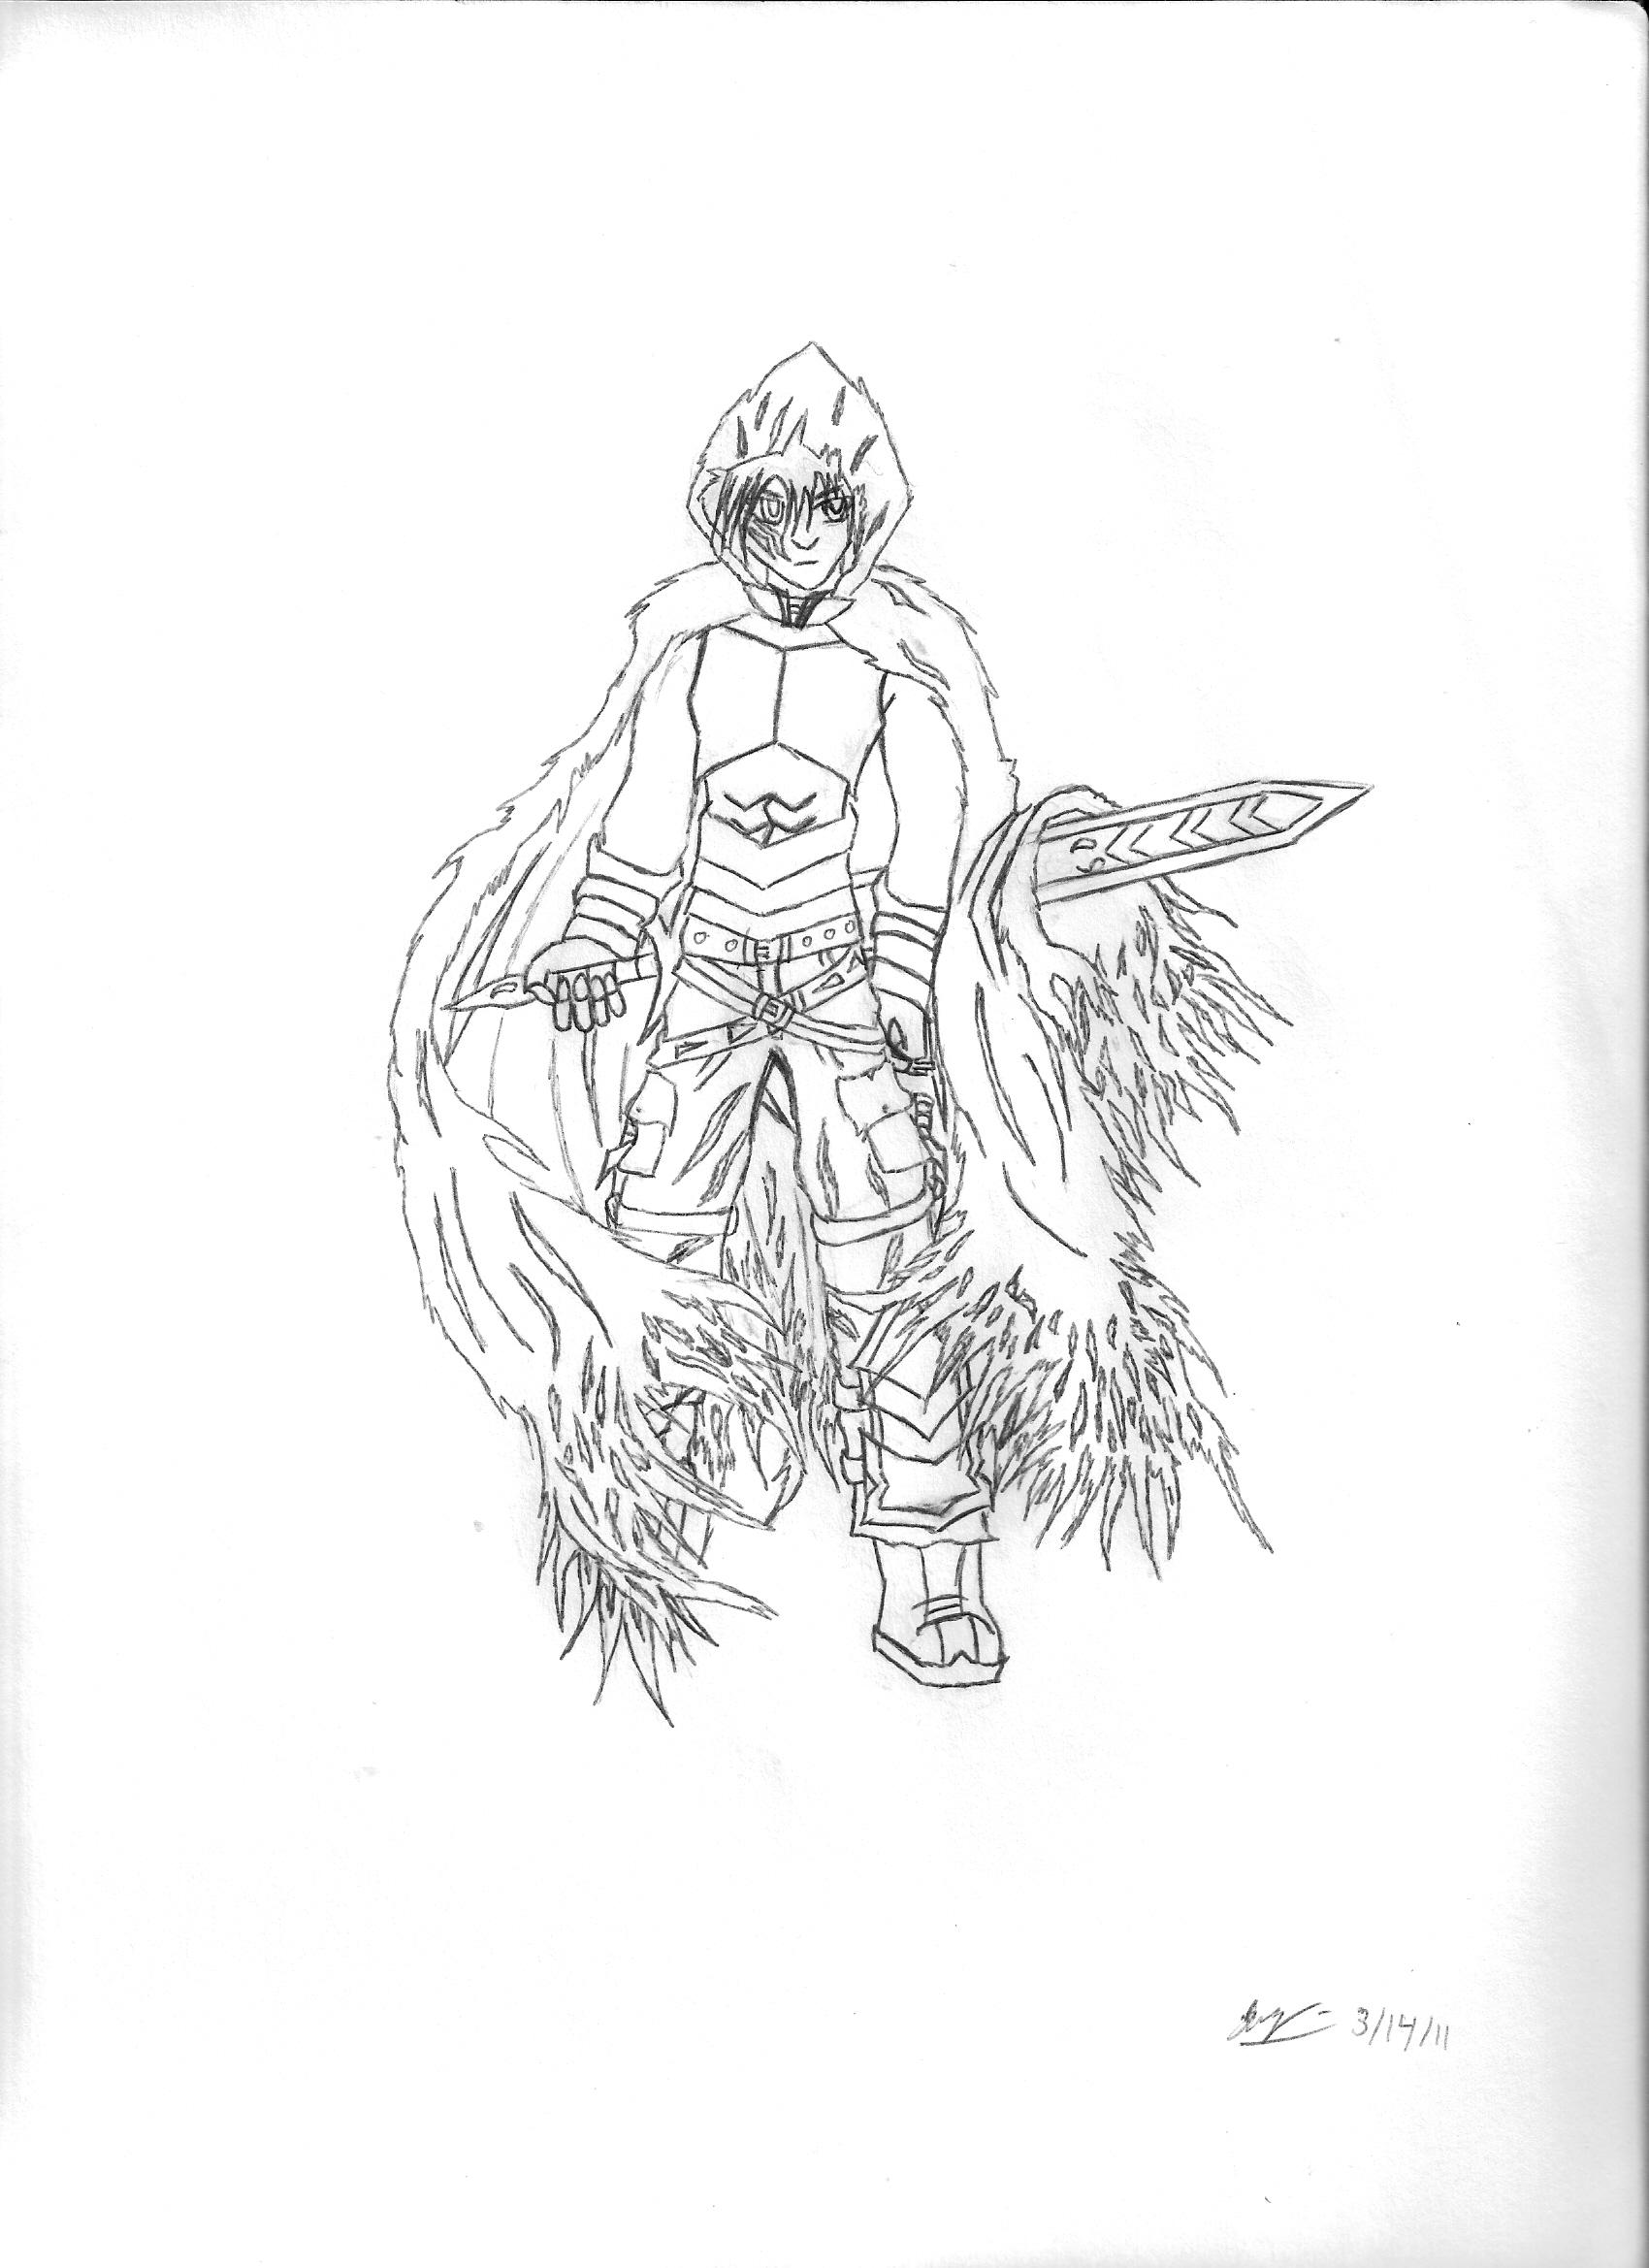 Zephyr - Soldier Uniform